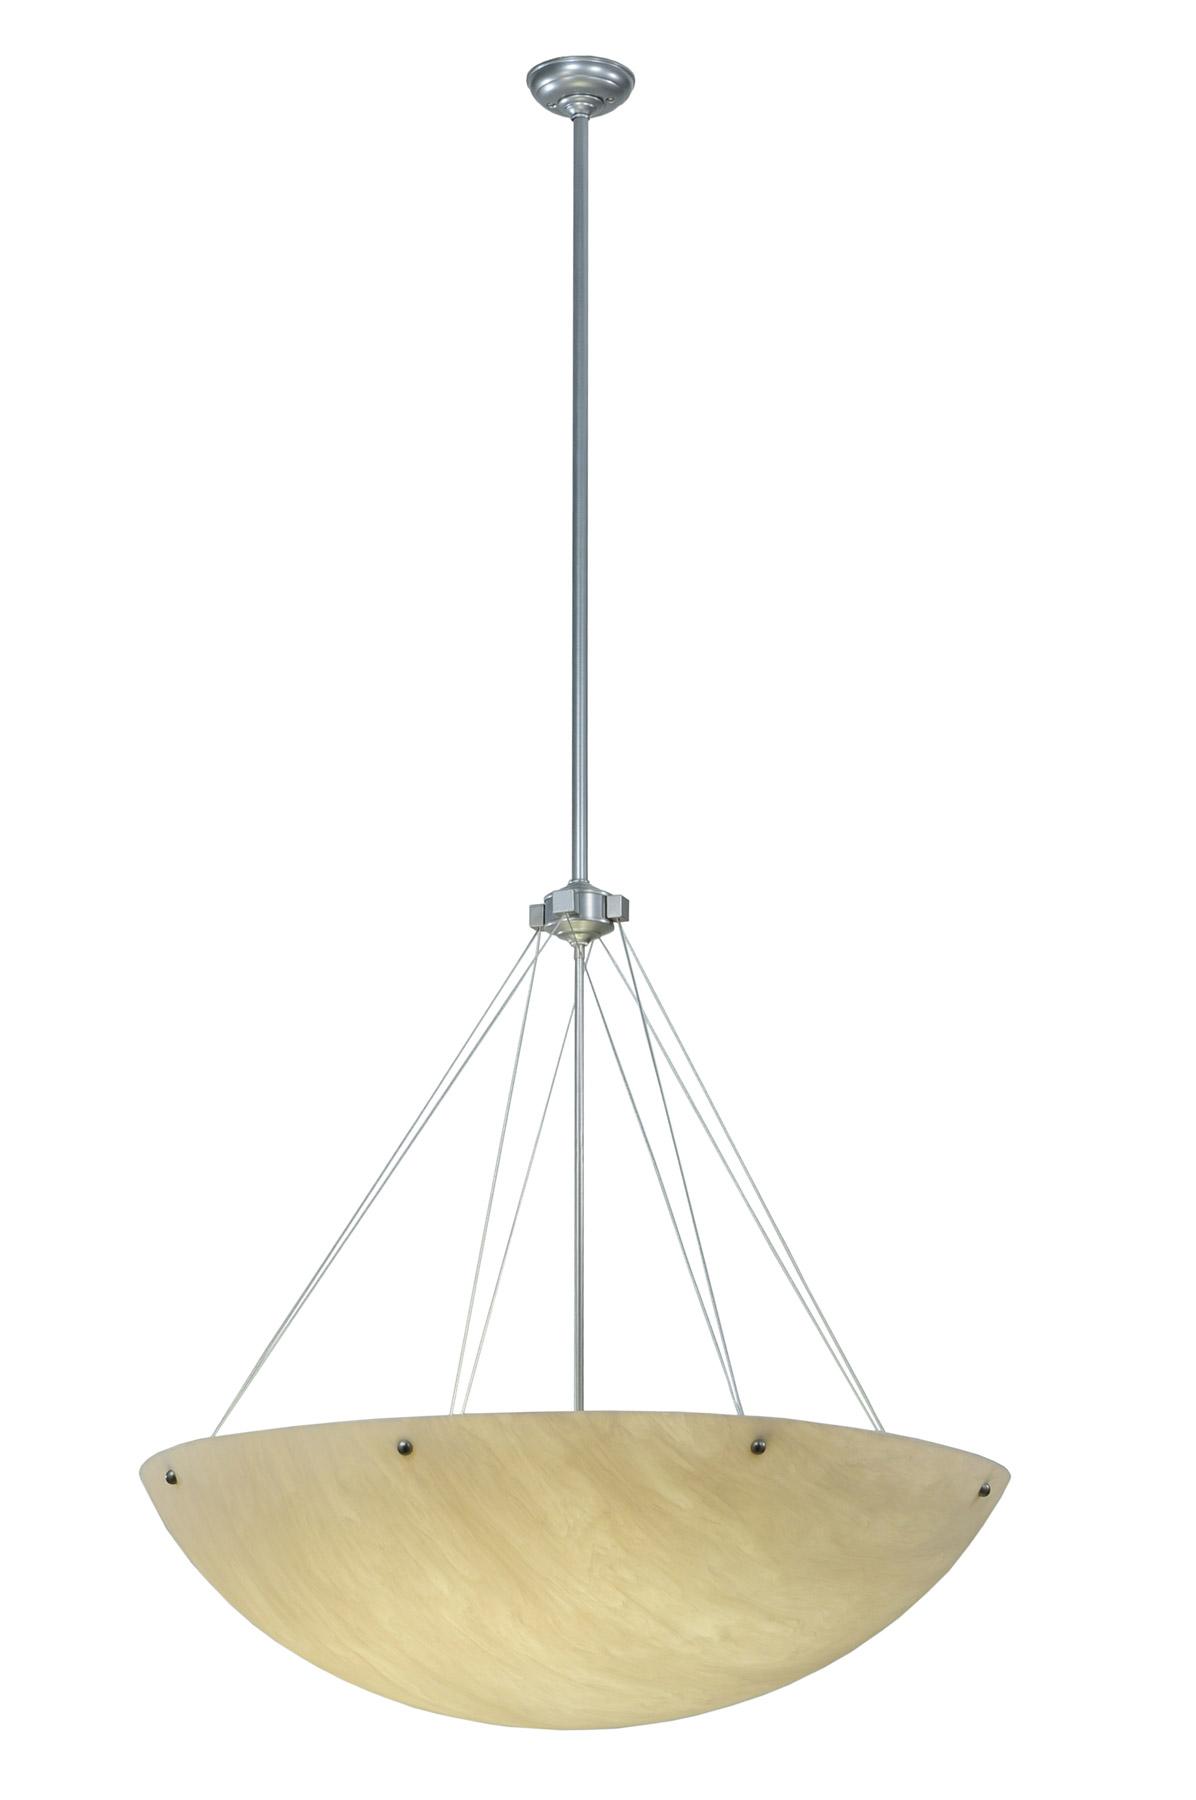 contemporary cypola inverted bowl pendant meyda 123137. Black Bedroom Furniture Sets. Home Design Ideas